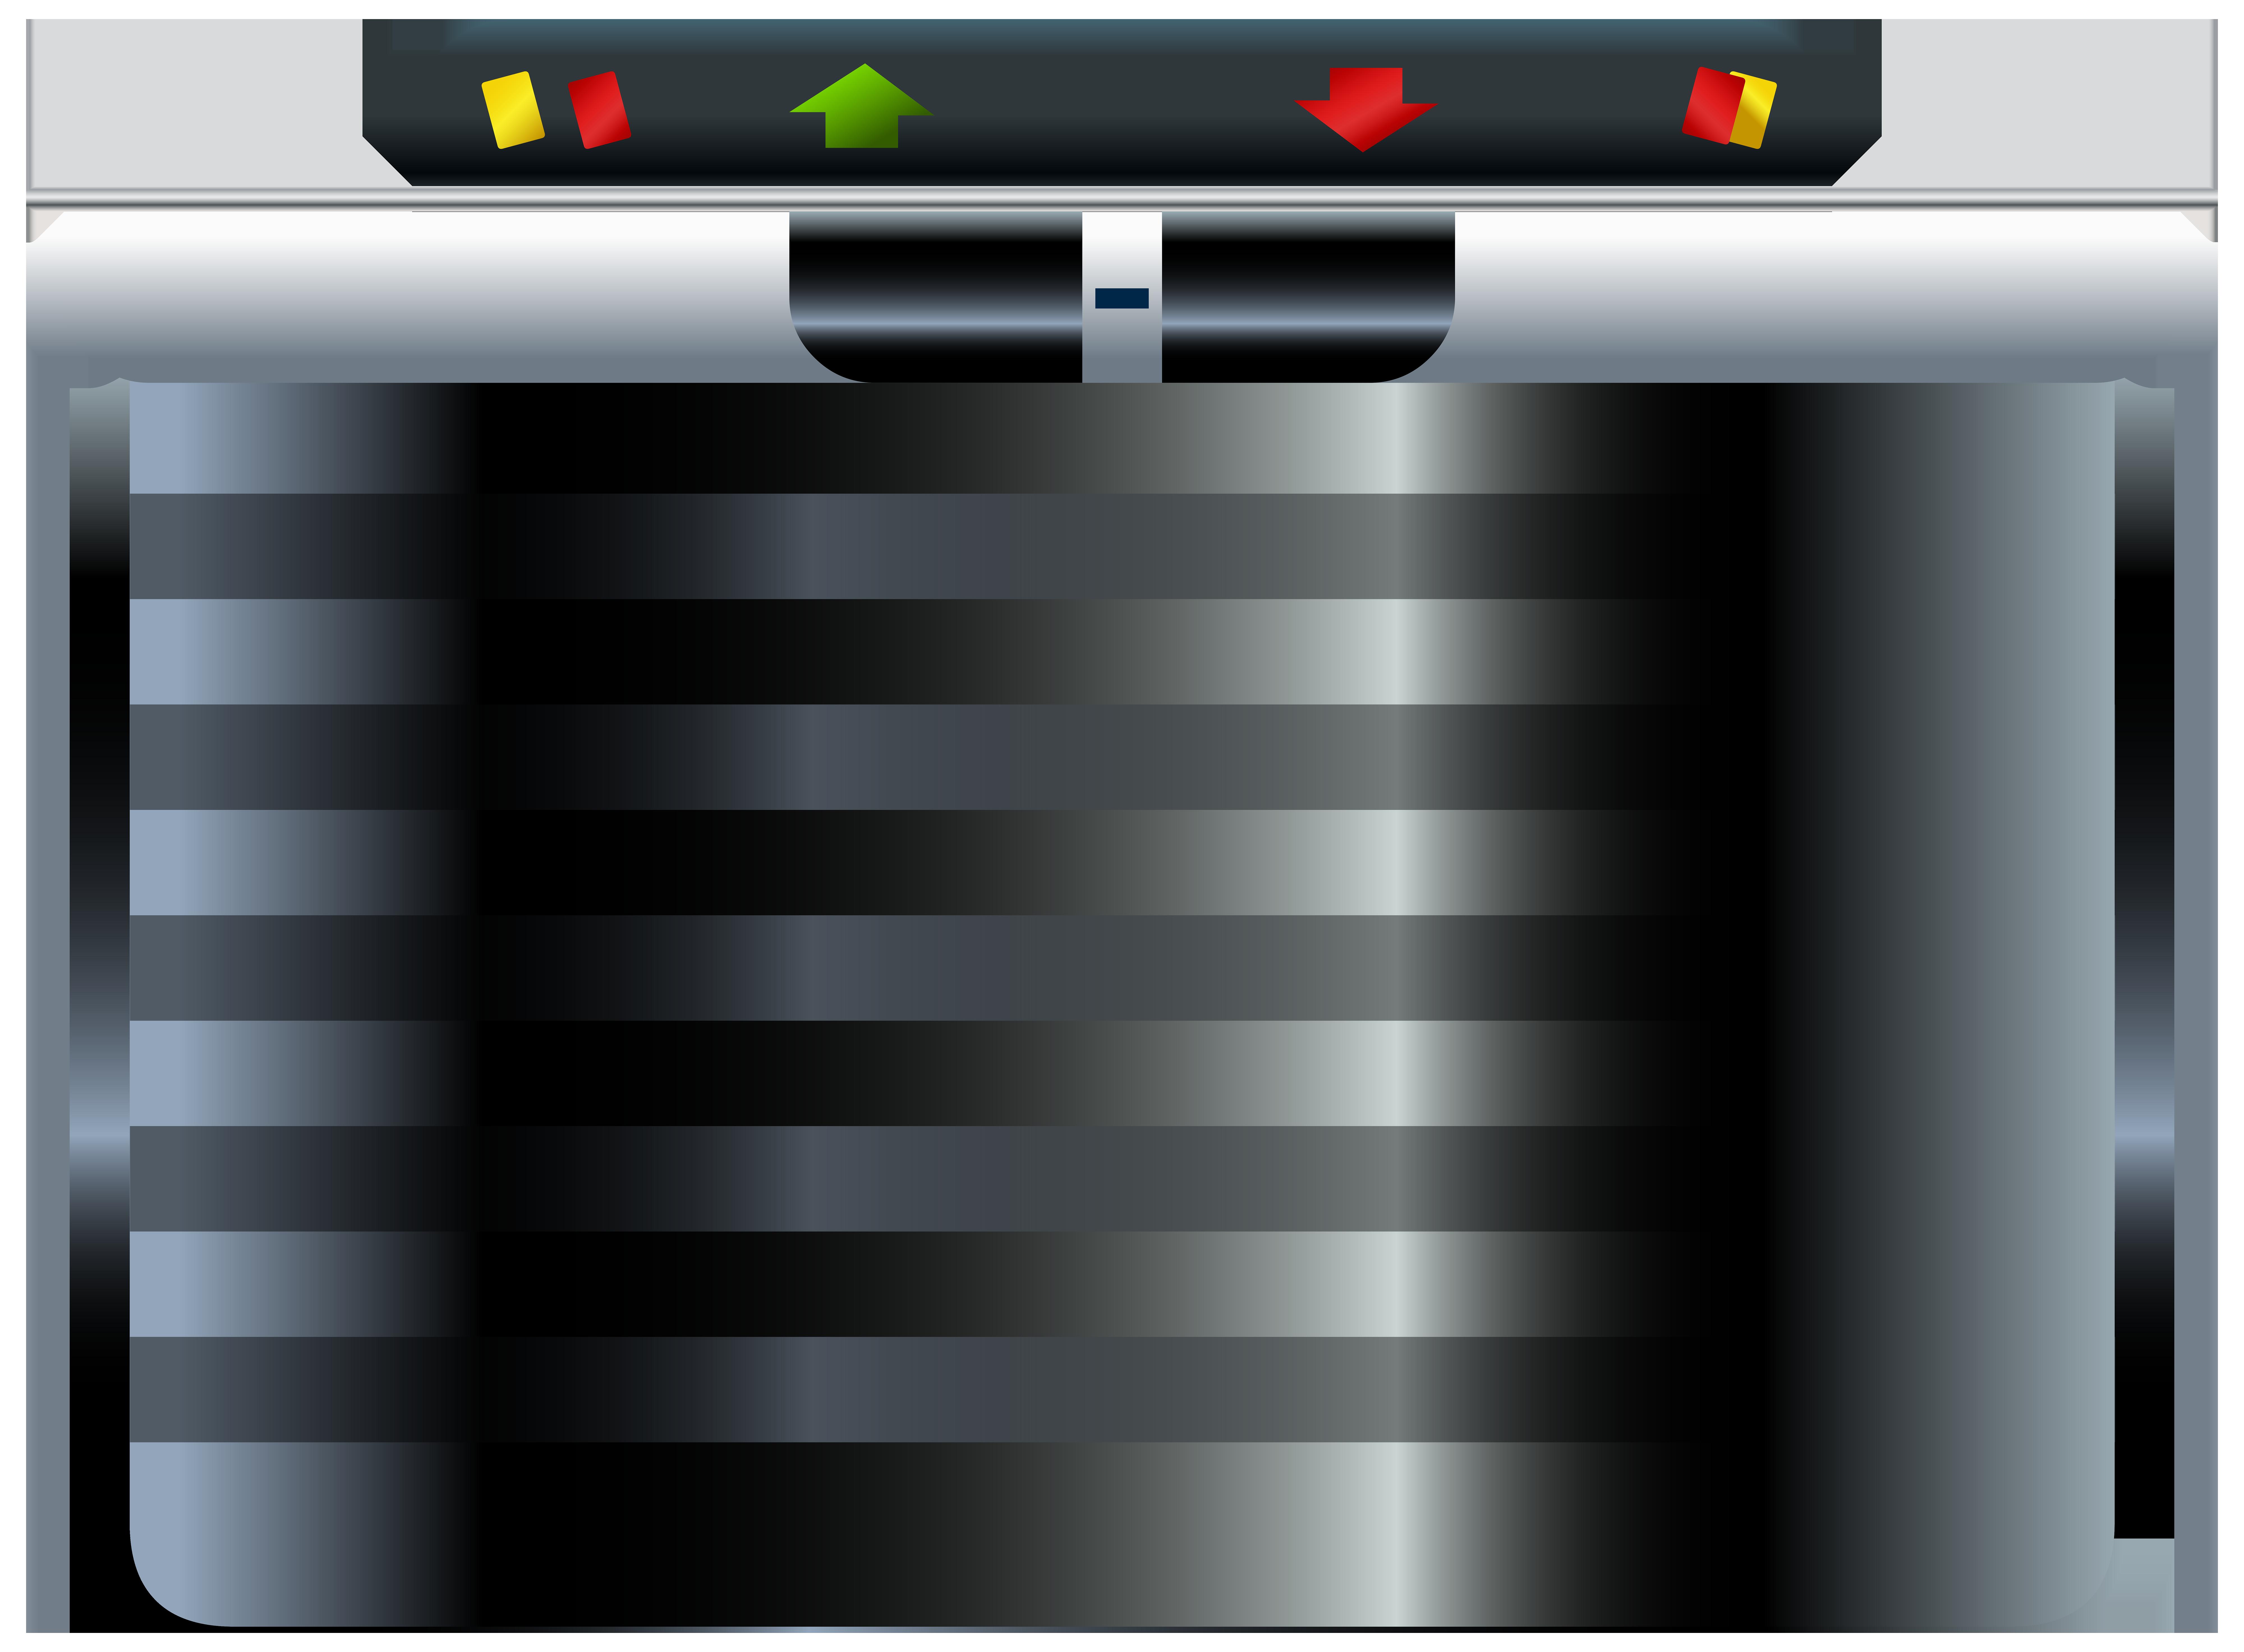 Scoreboard PNG Transparent Clip Art Image.